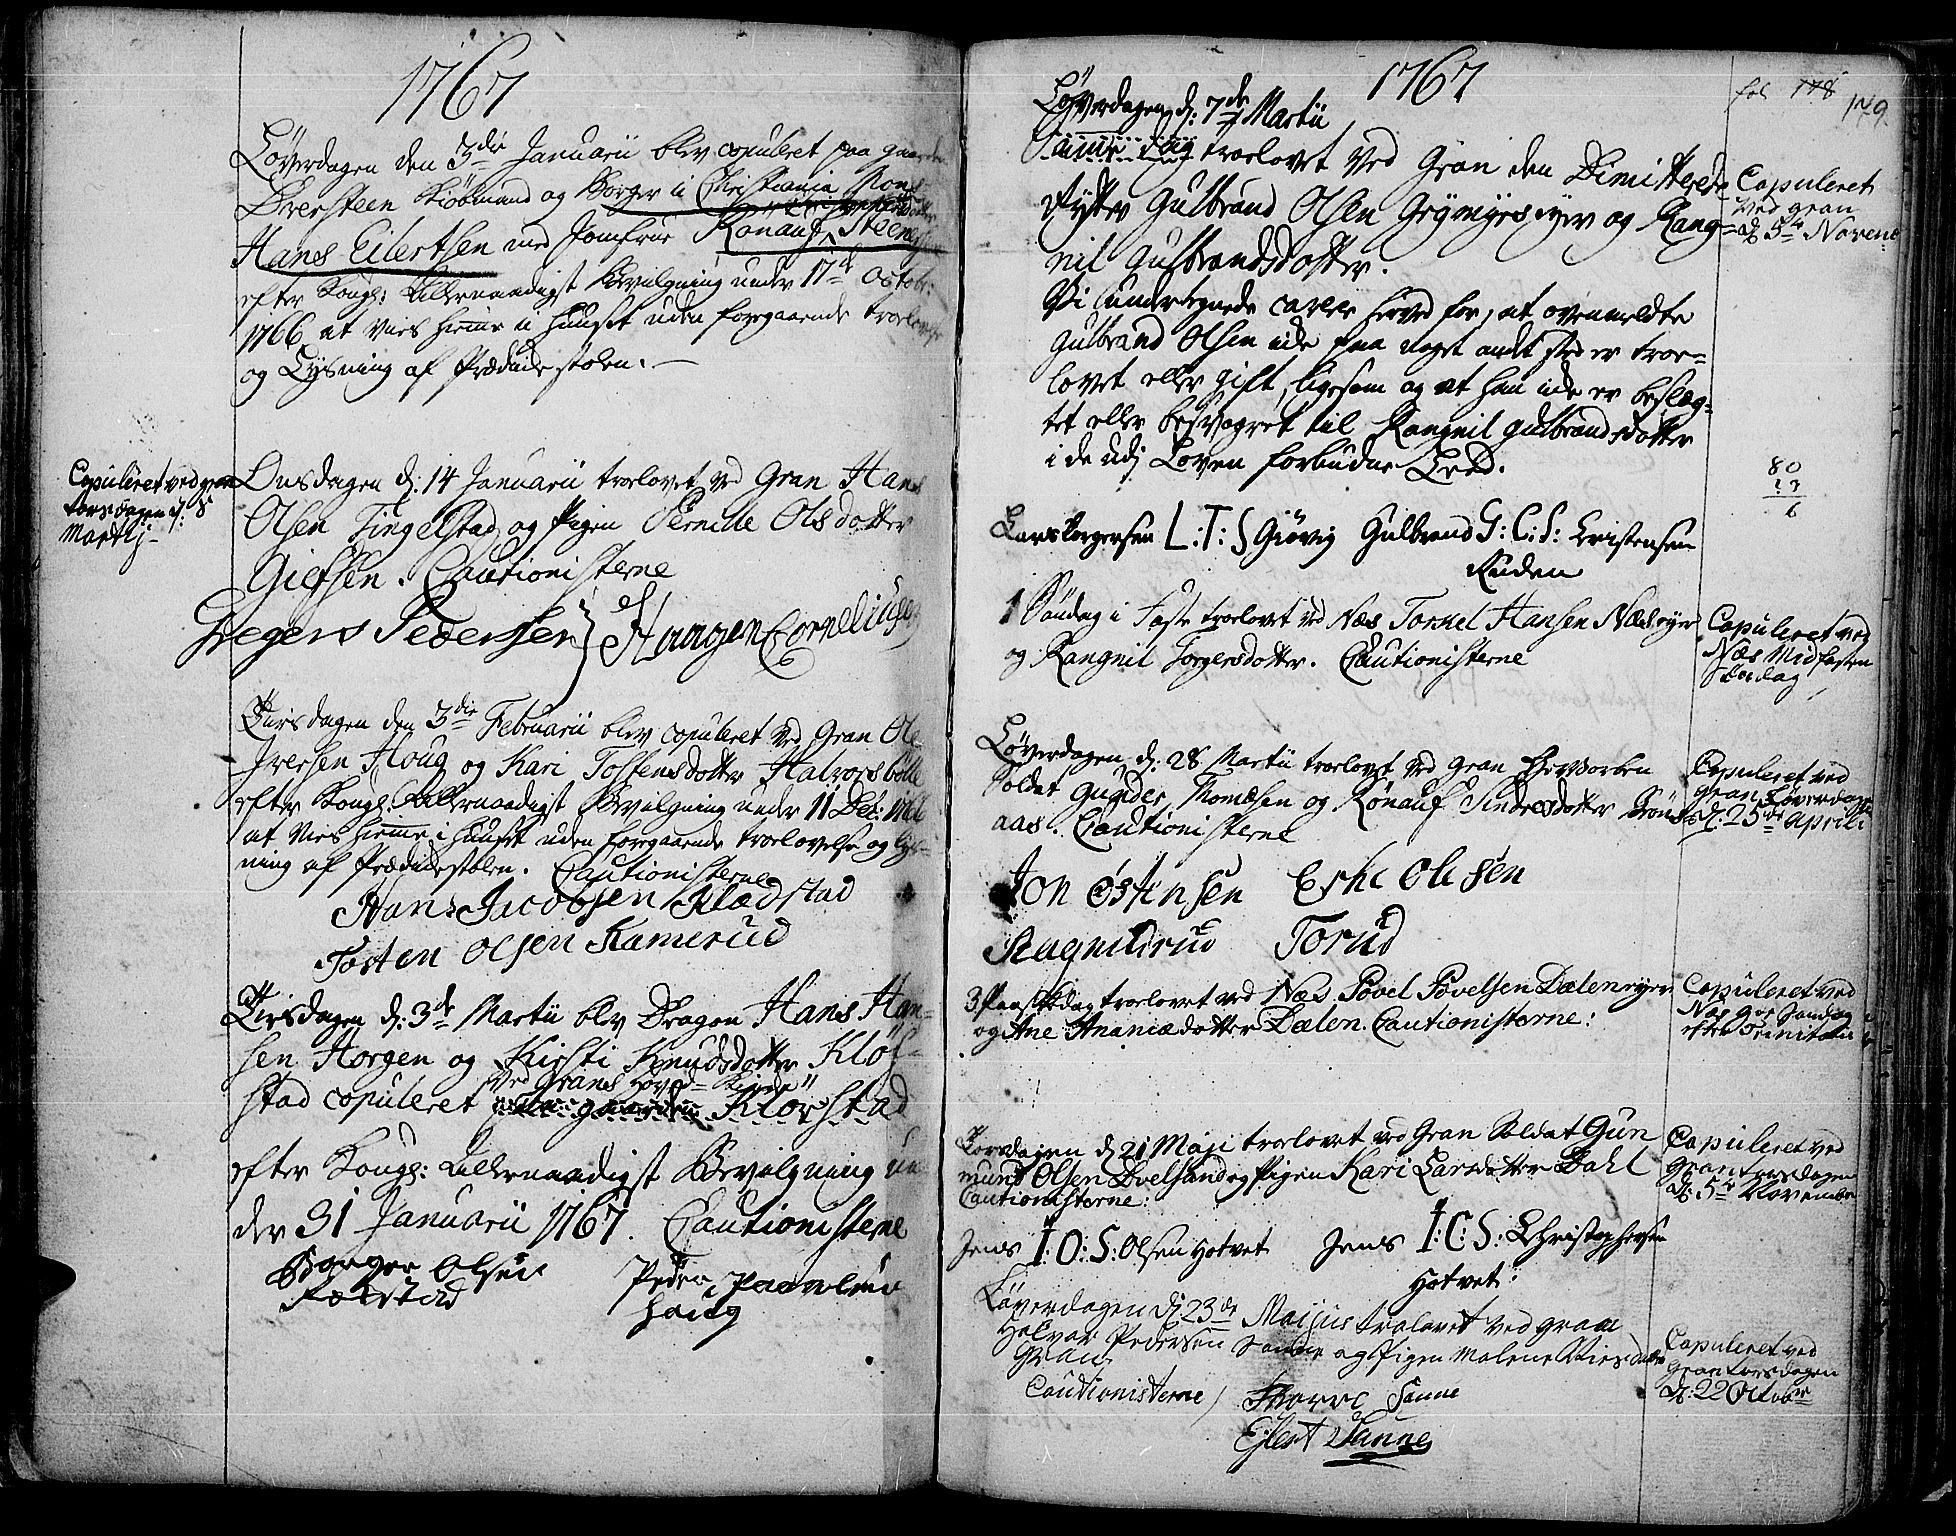 SAH, Gran prestekontor, Ministerialbok nr. 4, 1759-1775, s. 179